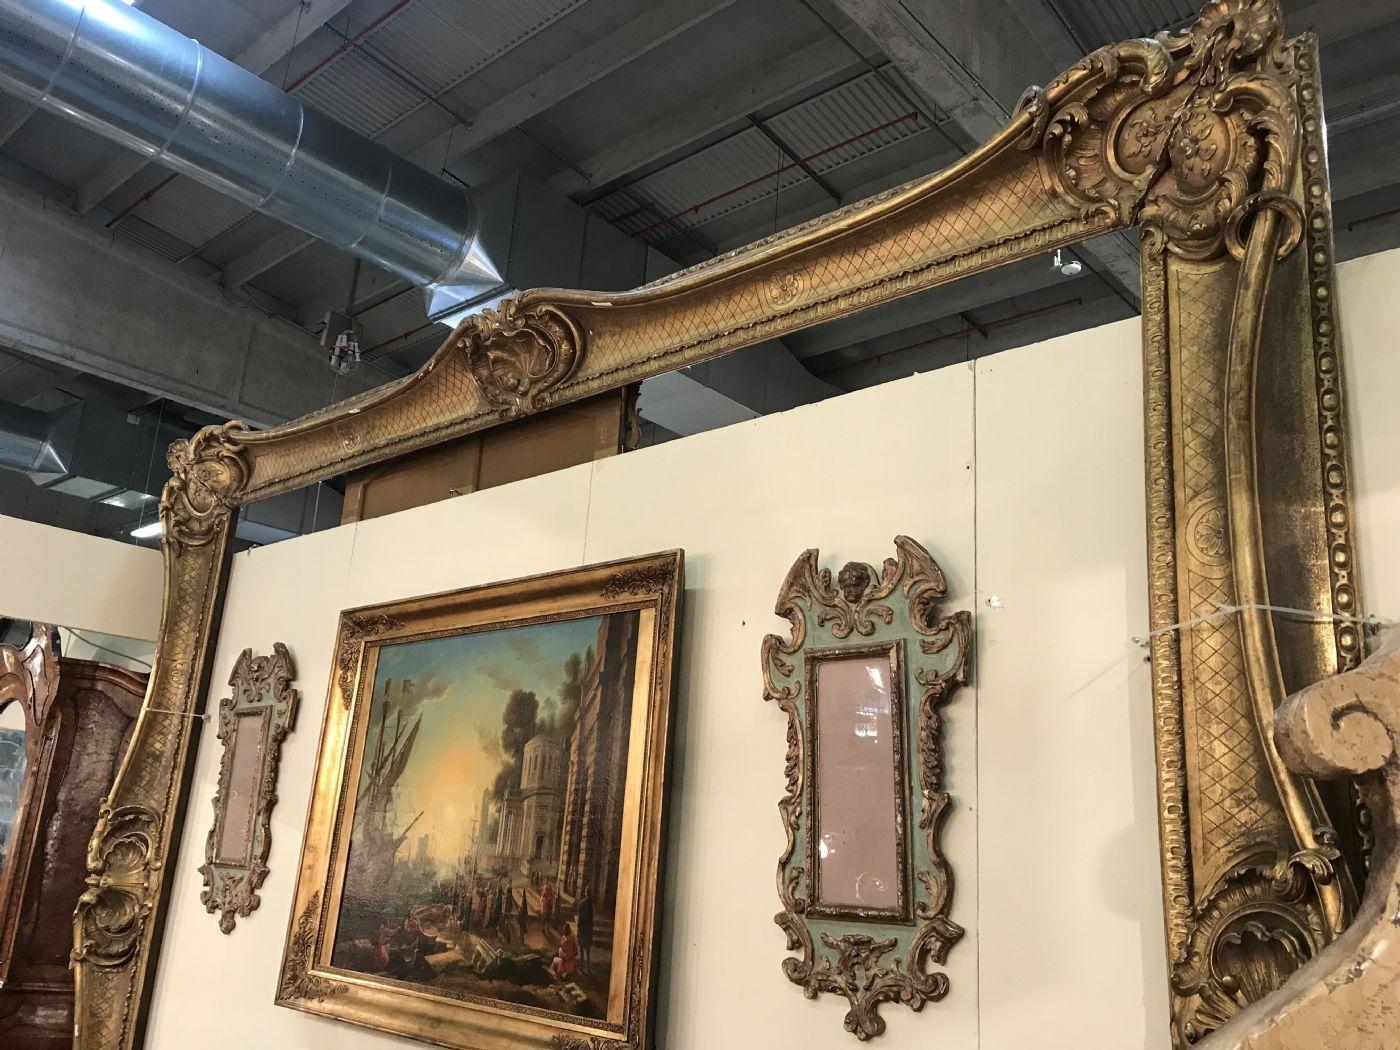 thumb2|An Grande cornice dorata Luigi 14 Venezia 292x360